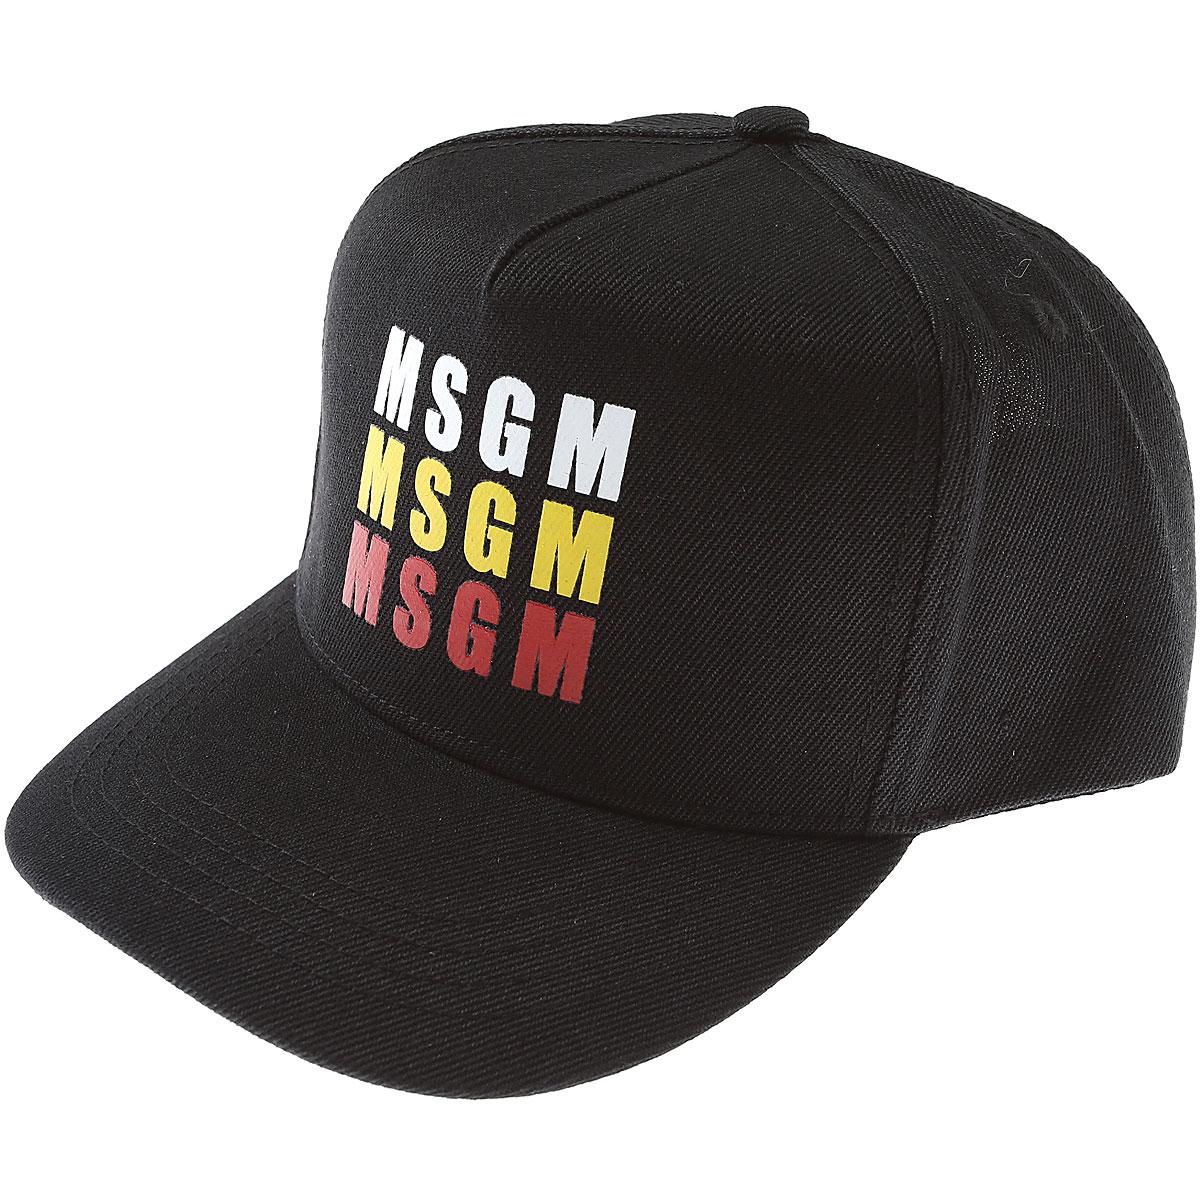 MSGM Accessories, Black, polyester, 2017